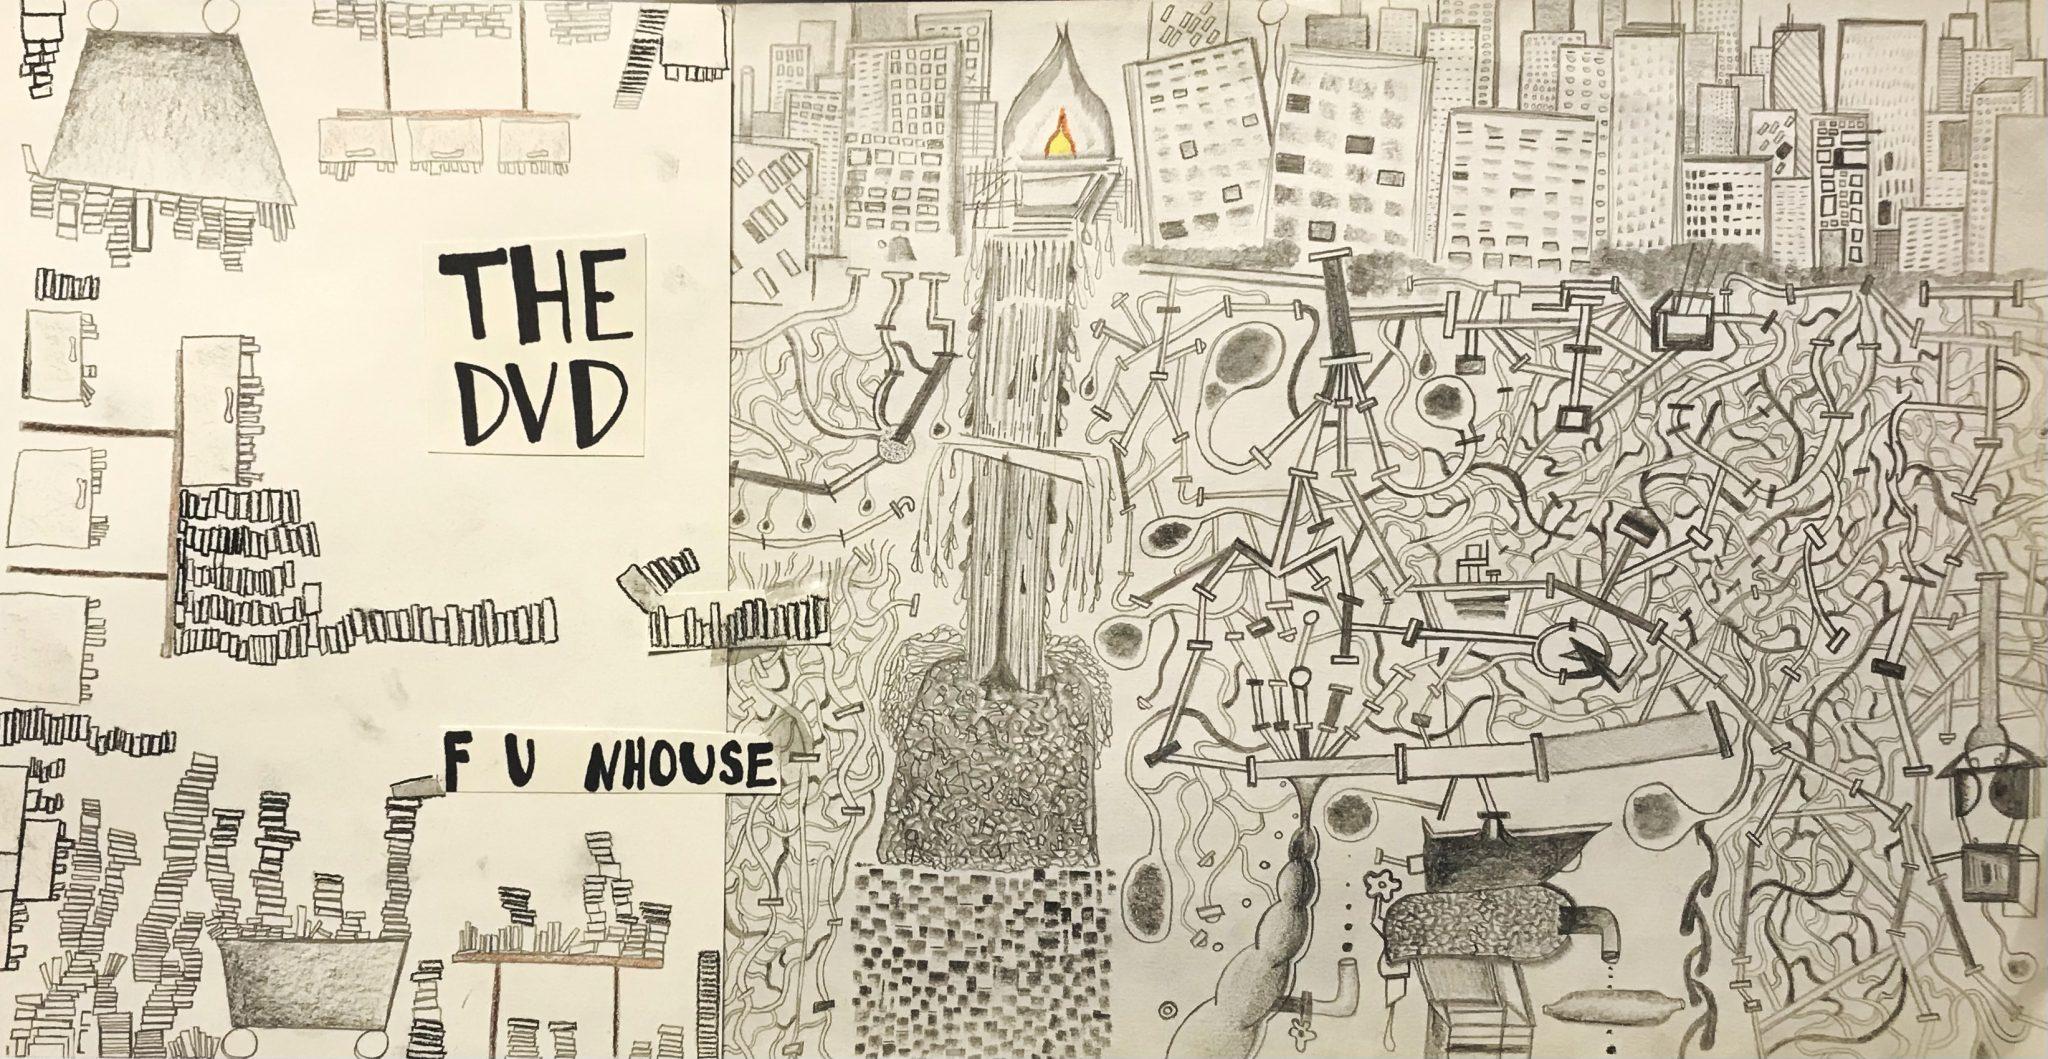 THE FUNHOUSE by Matt Lee